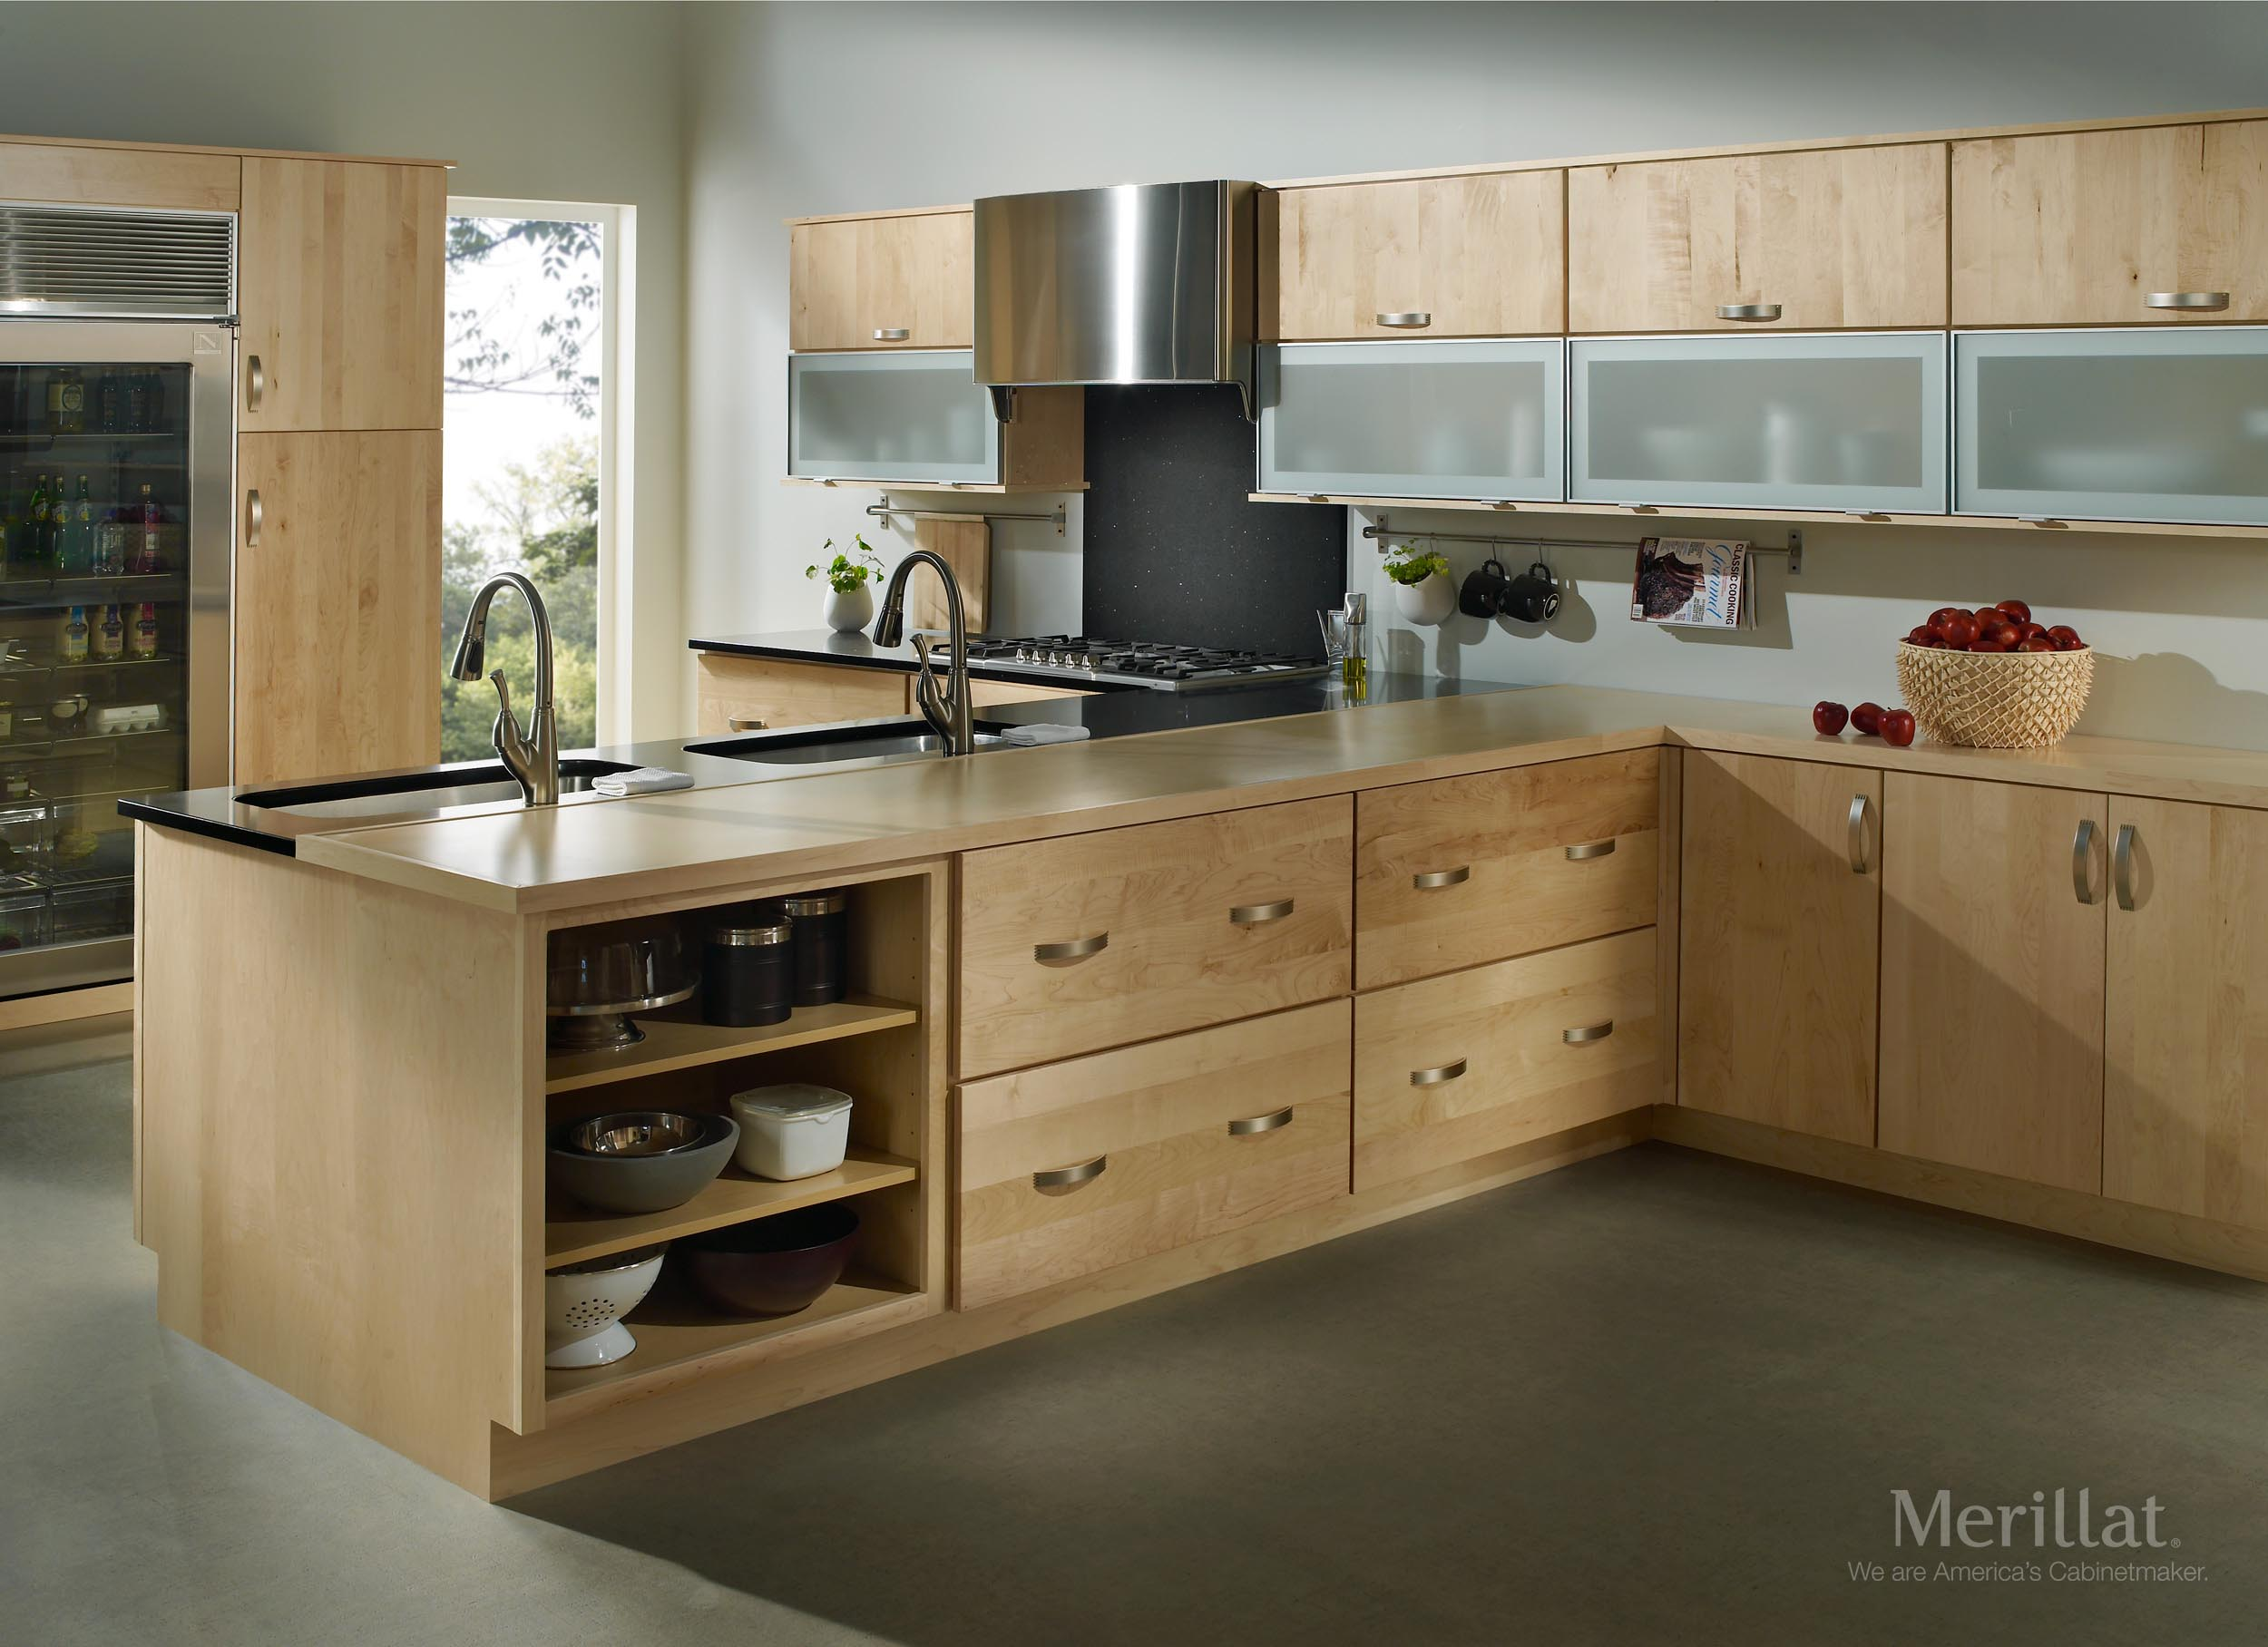 design your dream kitchen kitchen craft cabinets CraftwoodProducts com Merillat lg